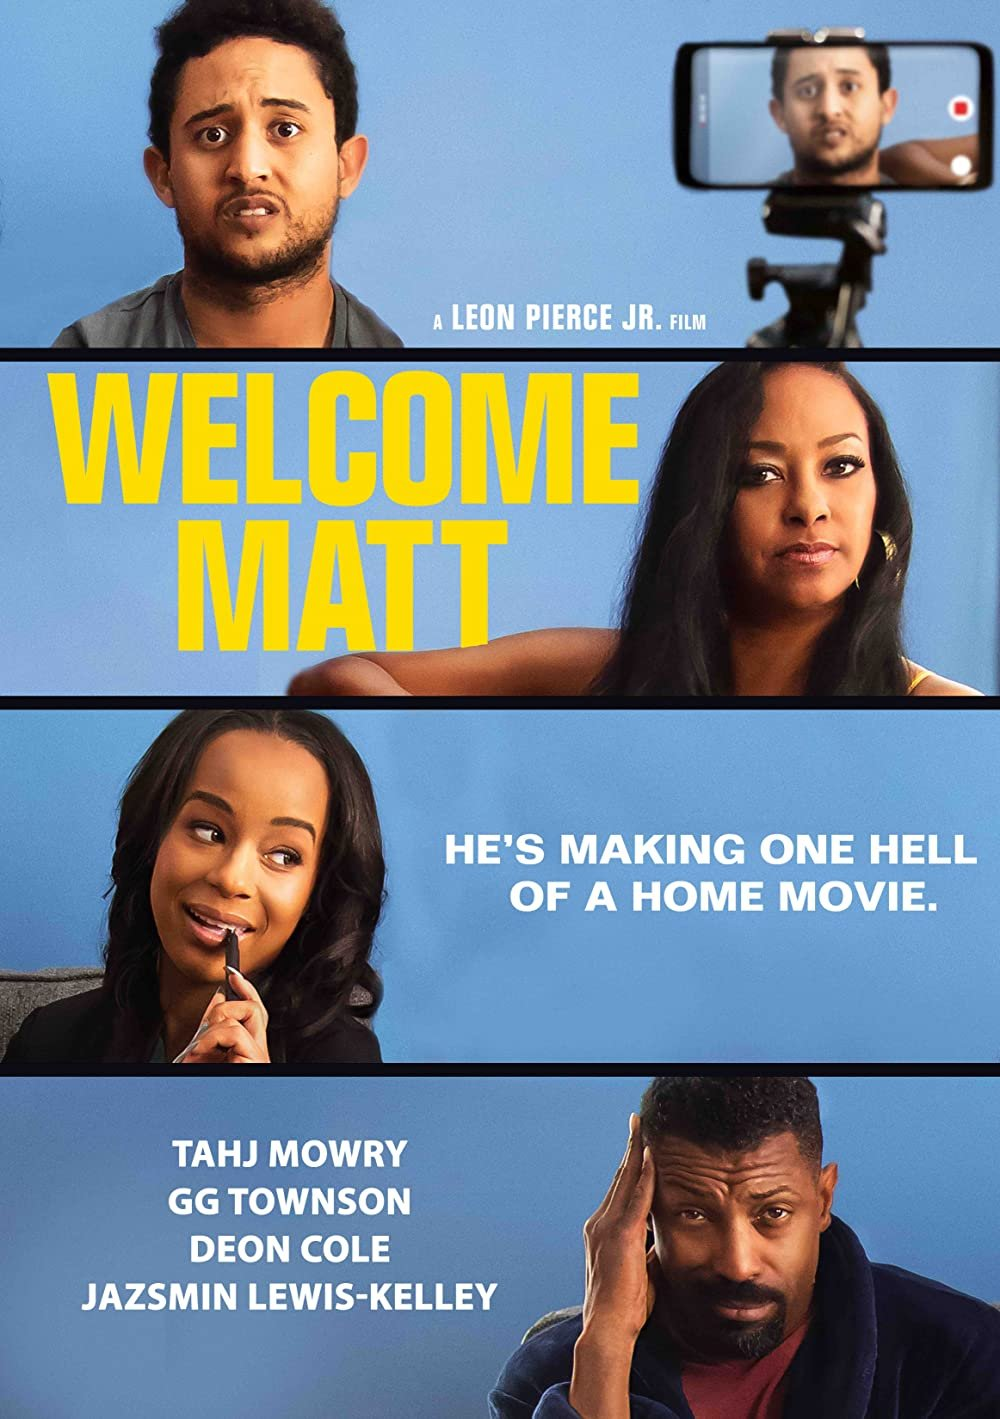 Welcome Matt poster image